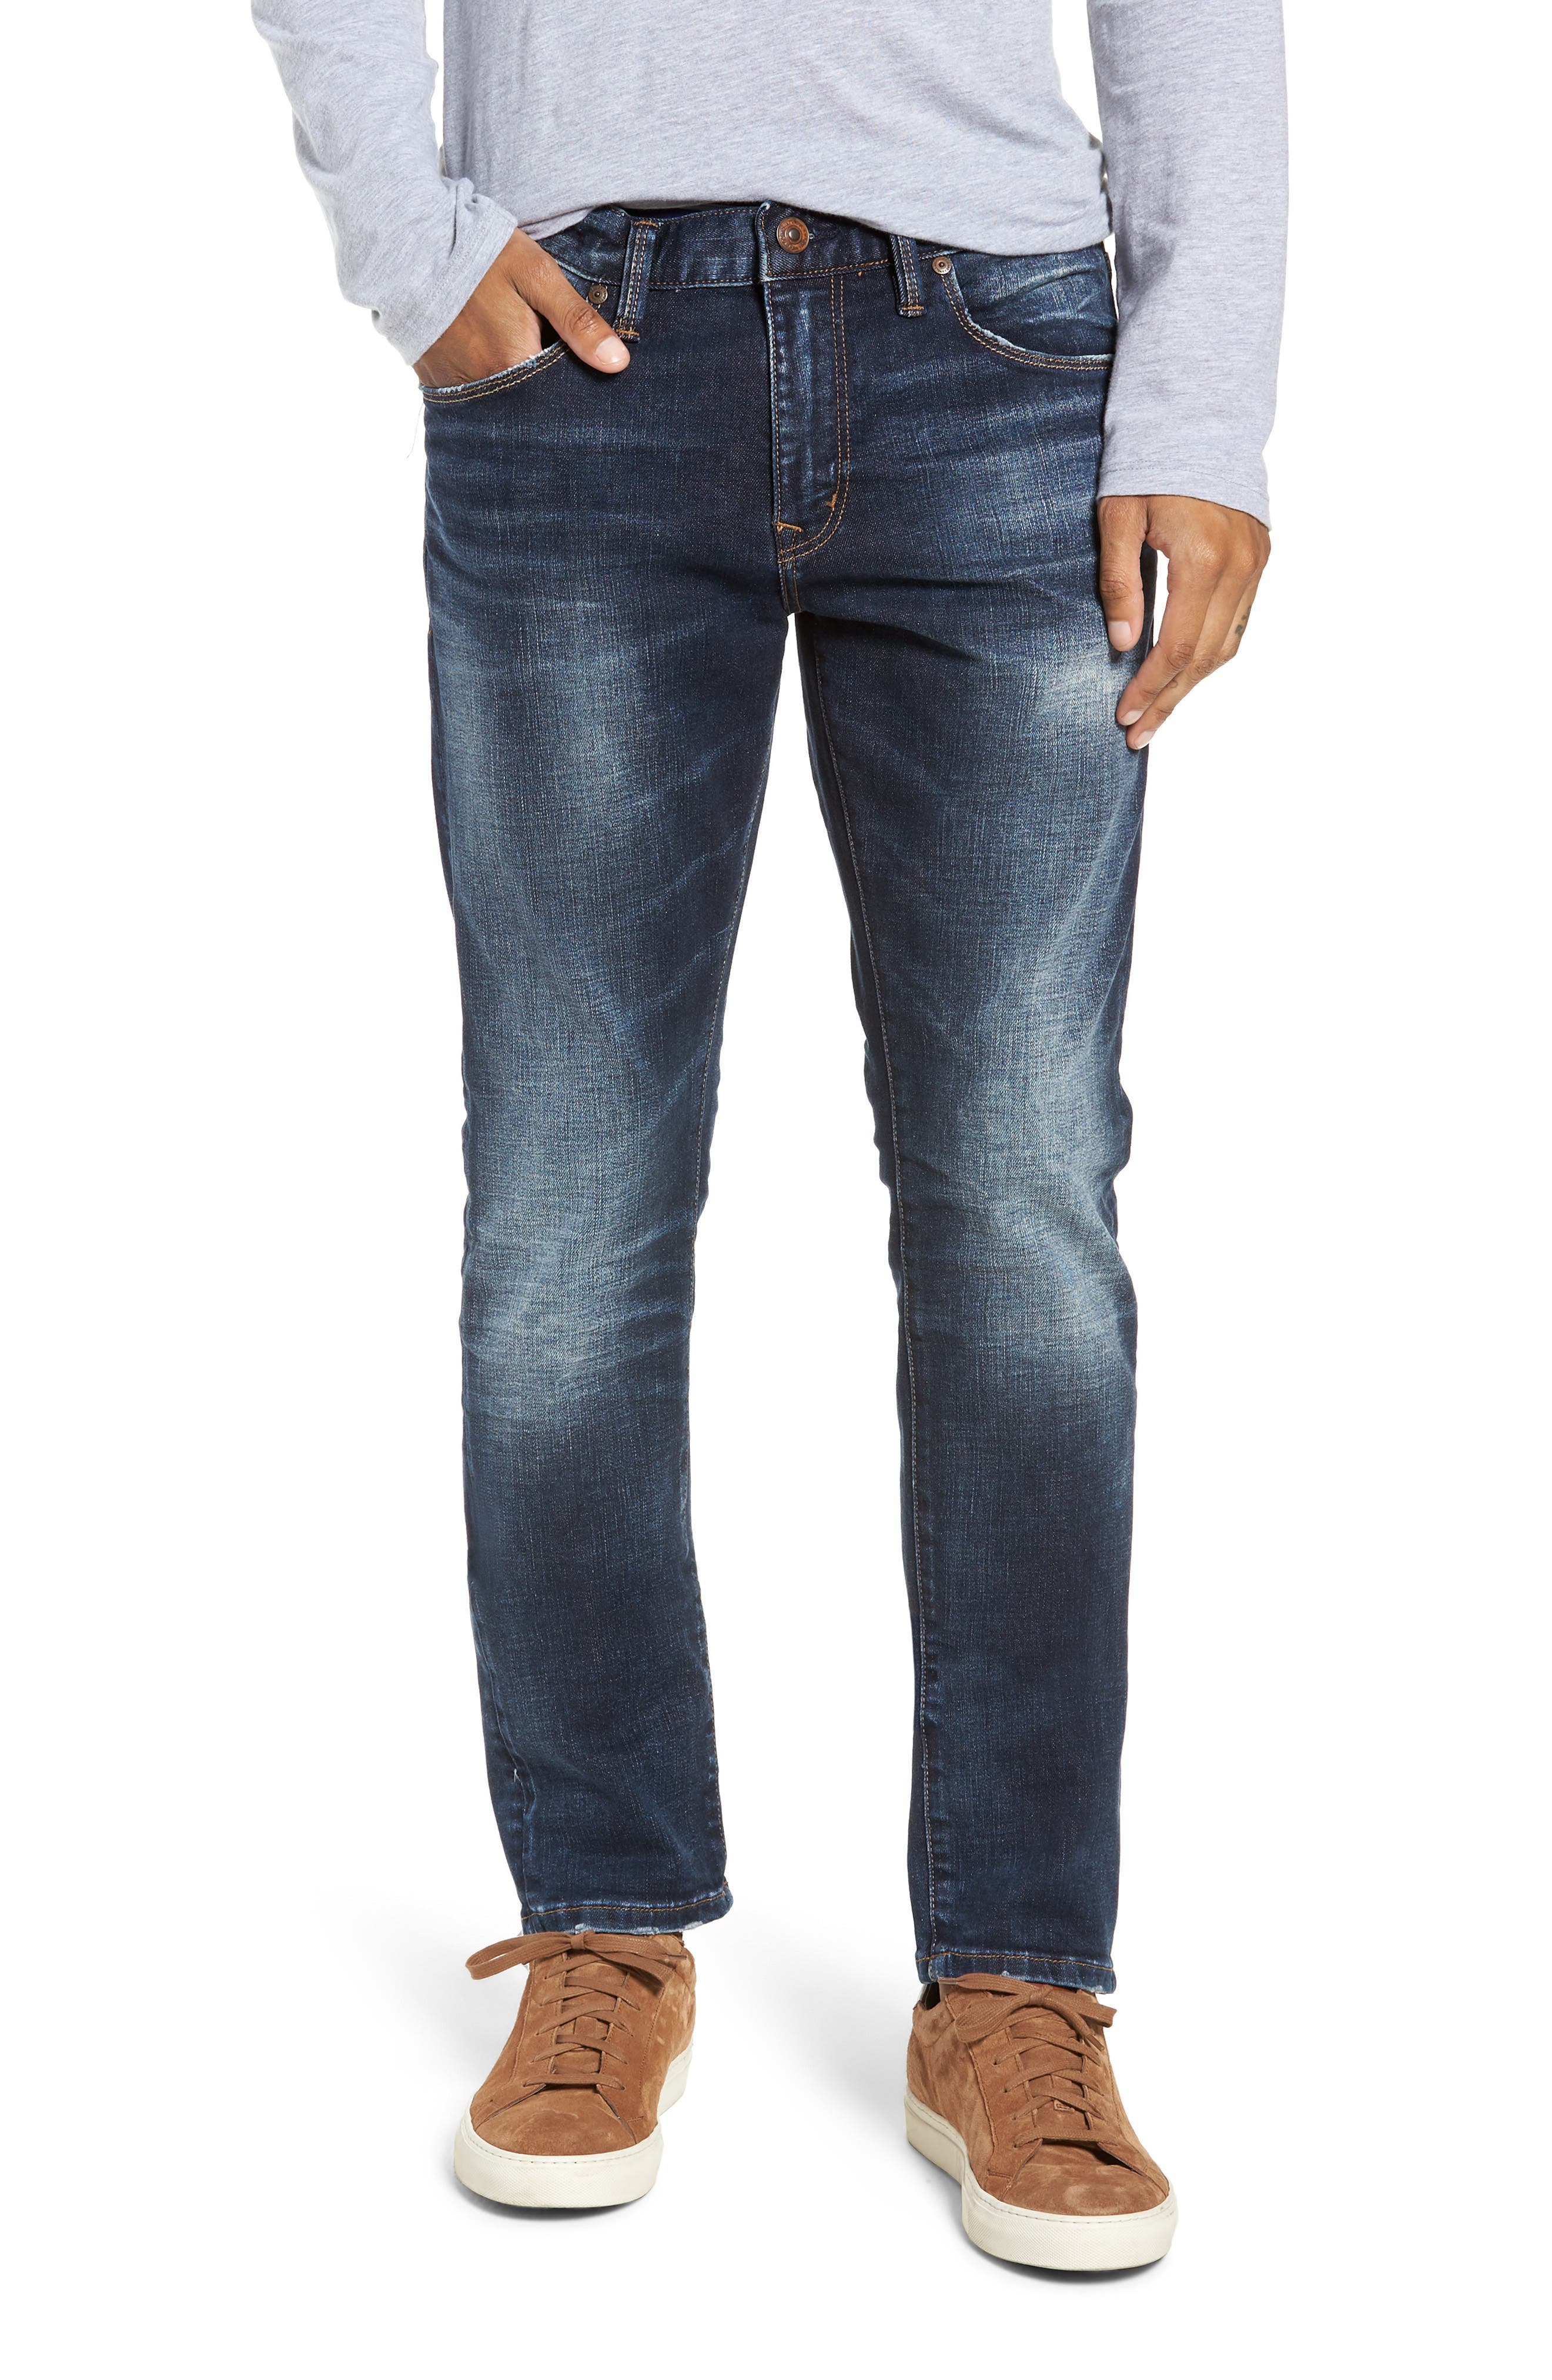 SILVER JEANS CO.,                             Ashdown Slim Straight Fit Jeans,                             Main thumbnail 1, color,                             INDIGO